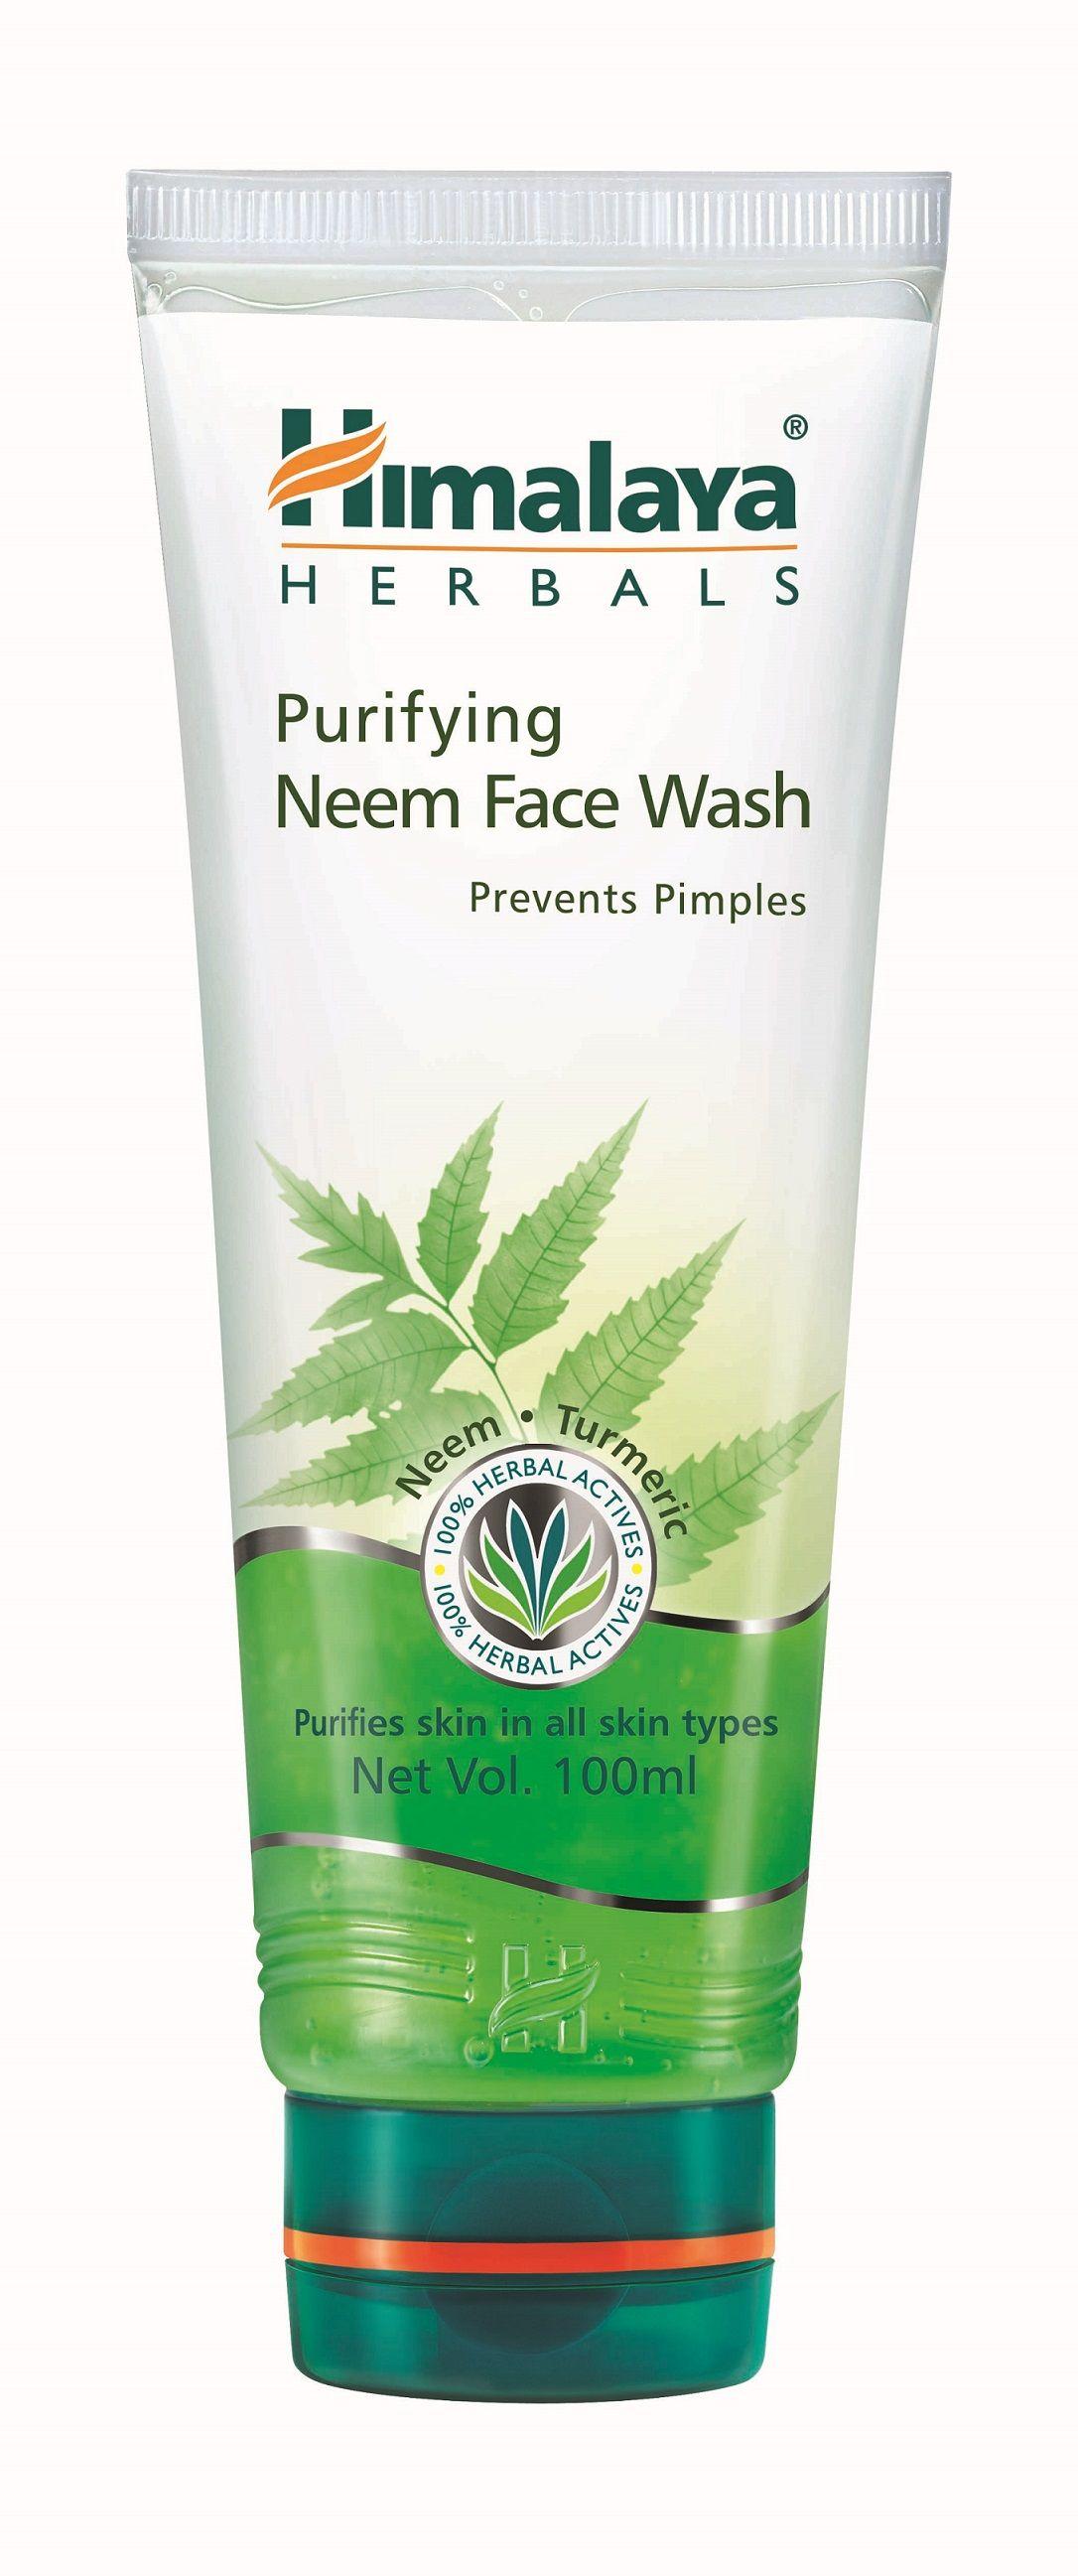 Himalaya Herbals Purifying Neem Face Wash 100ml